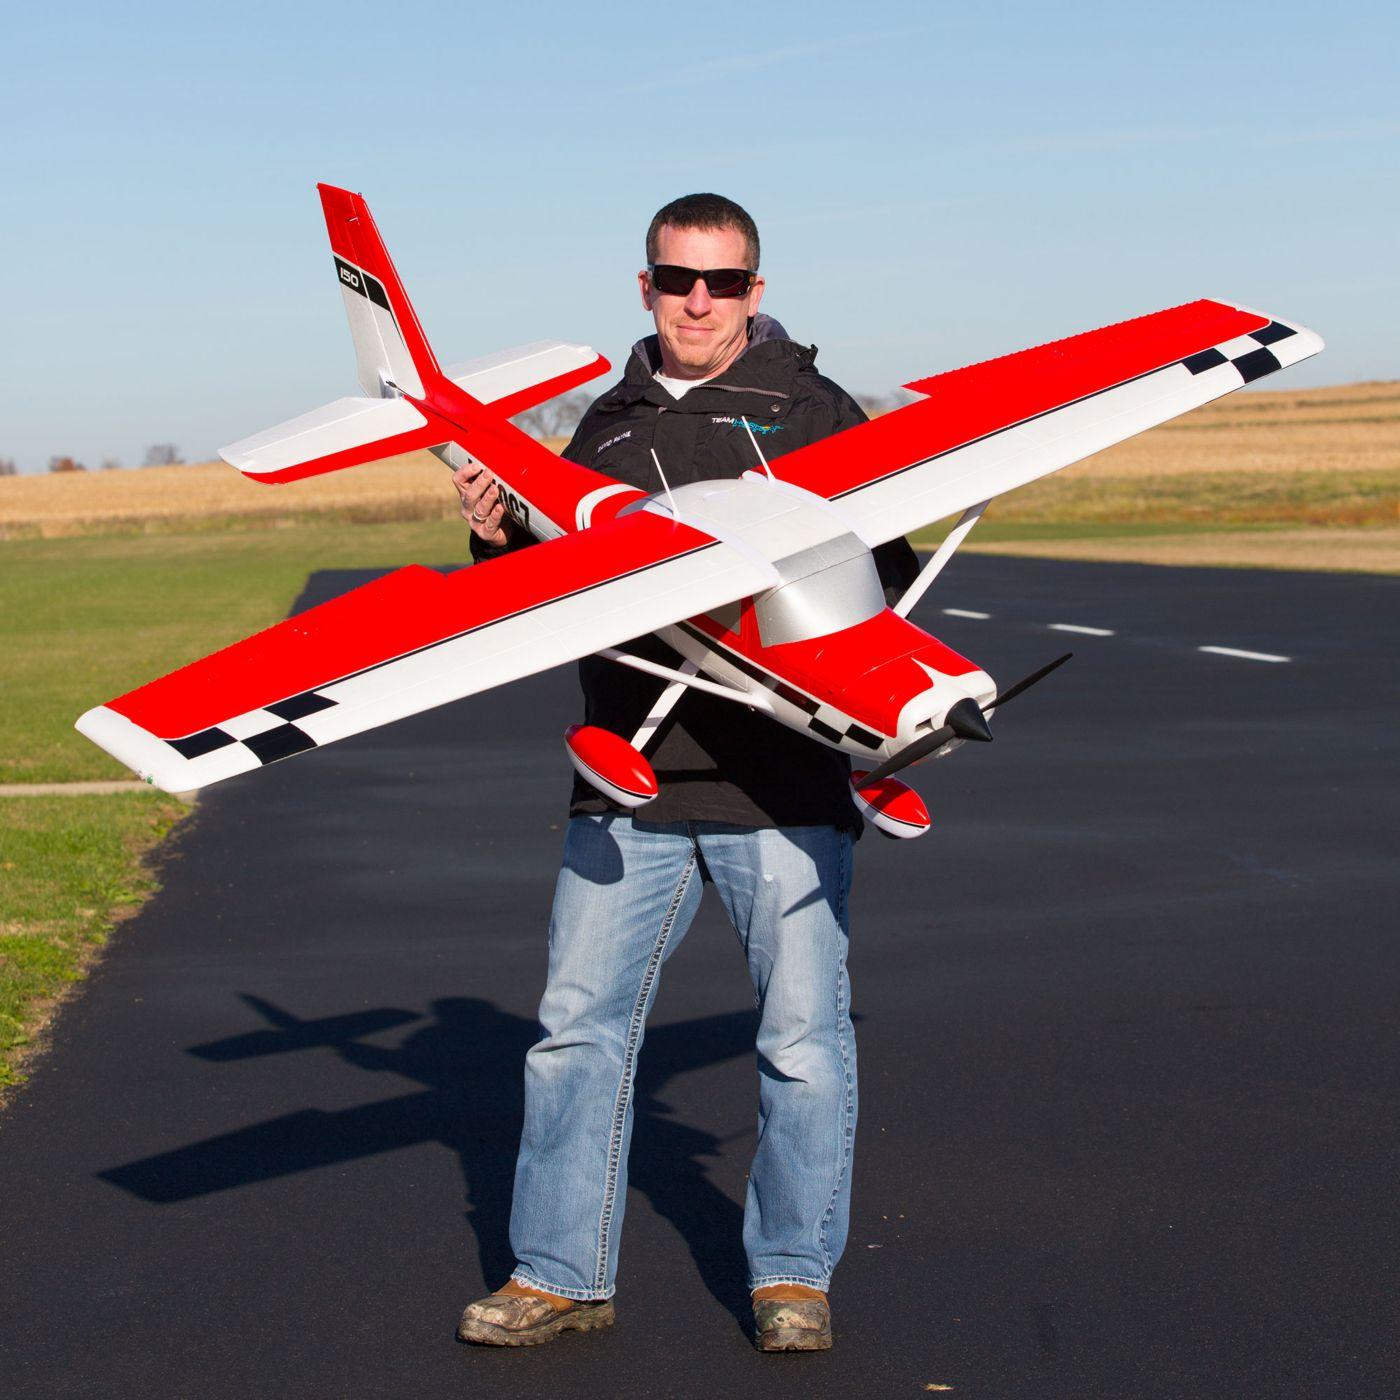 E-flite Carbon Z Cessna 150 2.1m BNF Basic 05